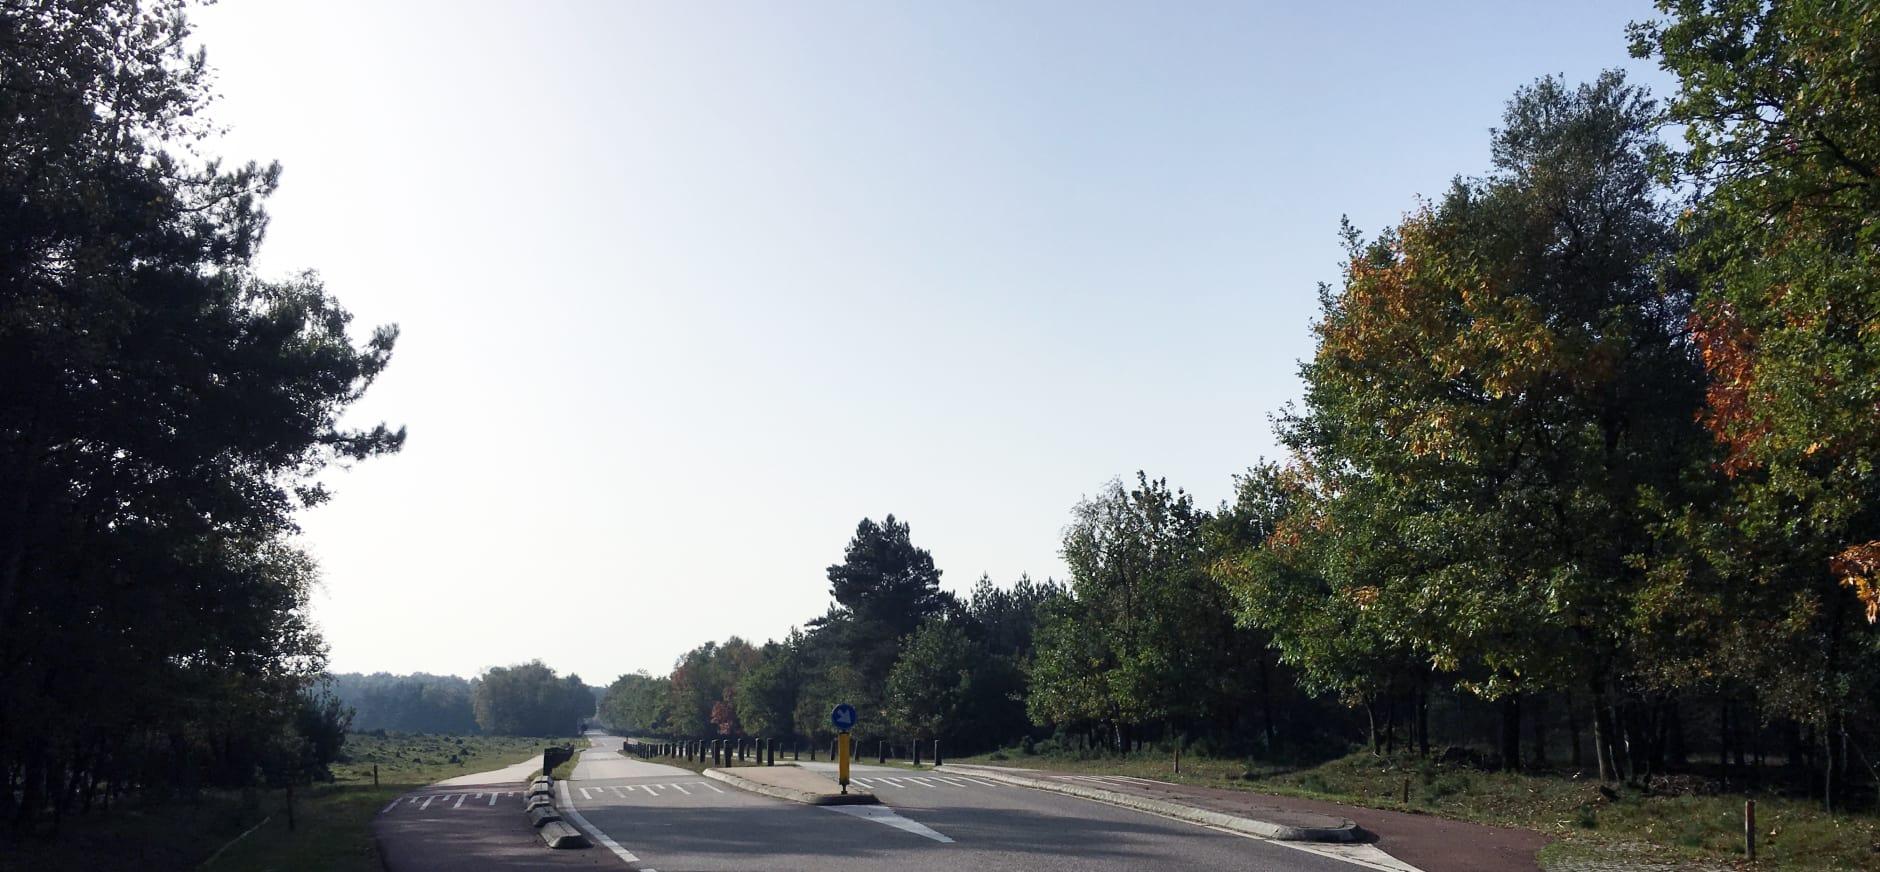 Verbetering faunapassage Deelenseweg